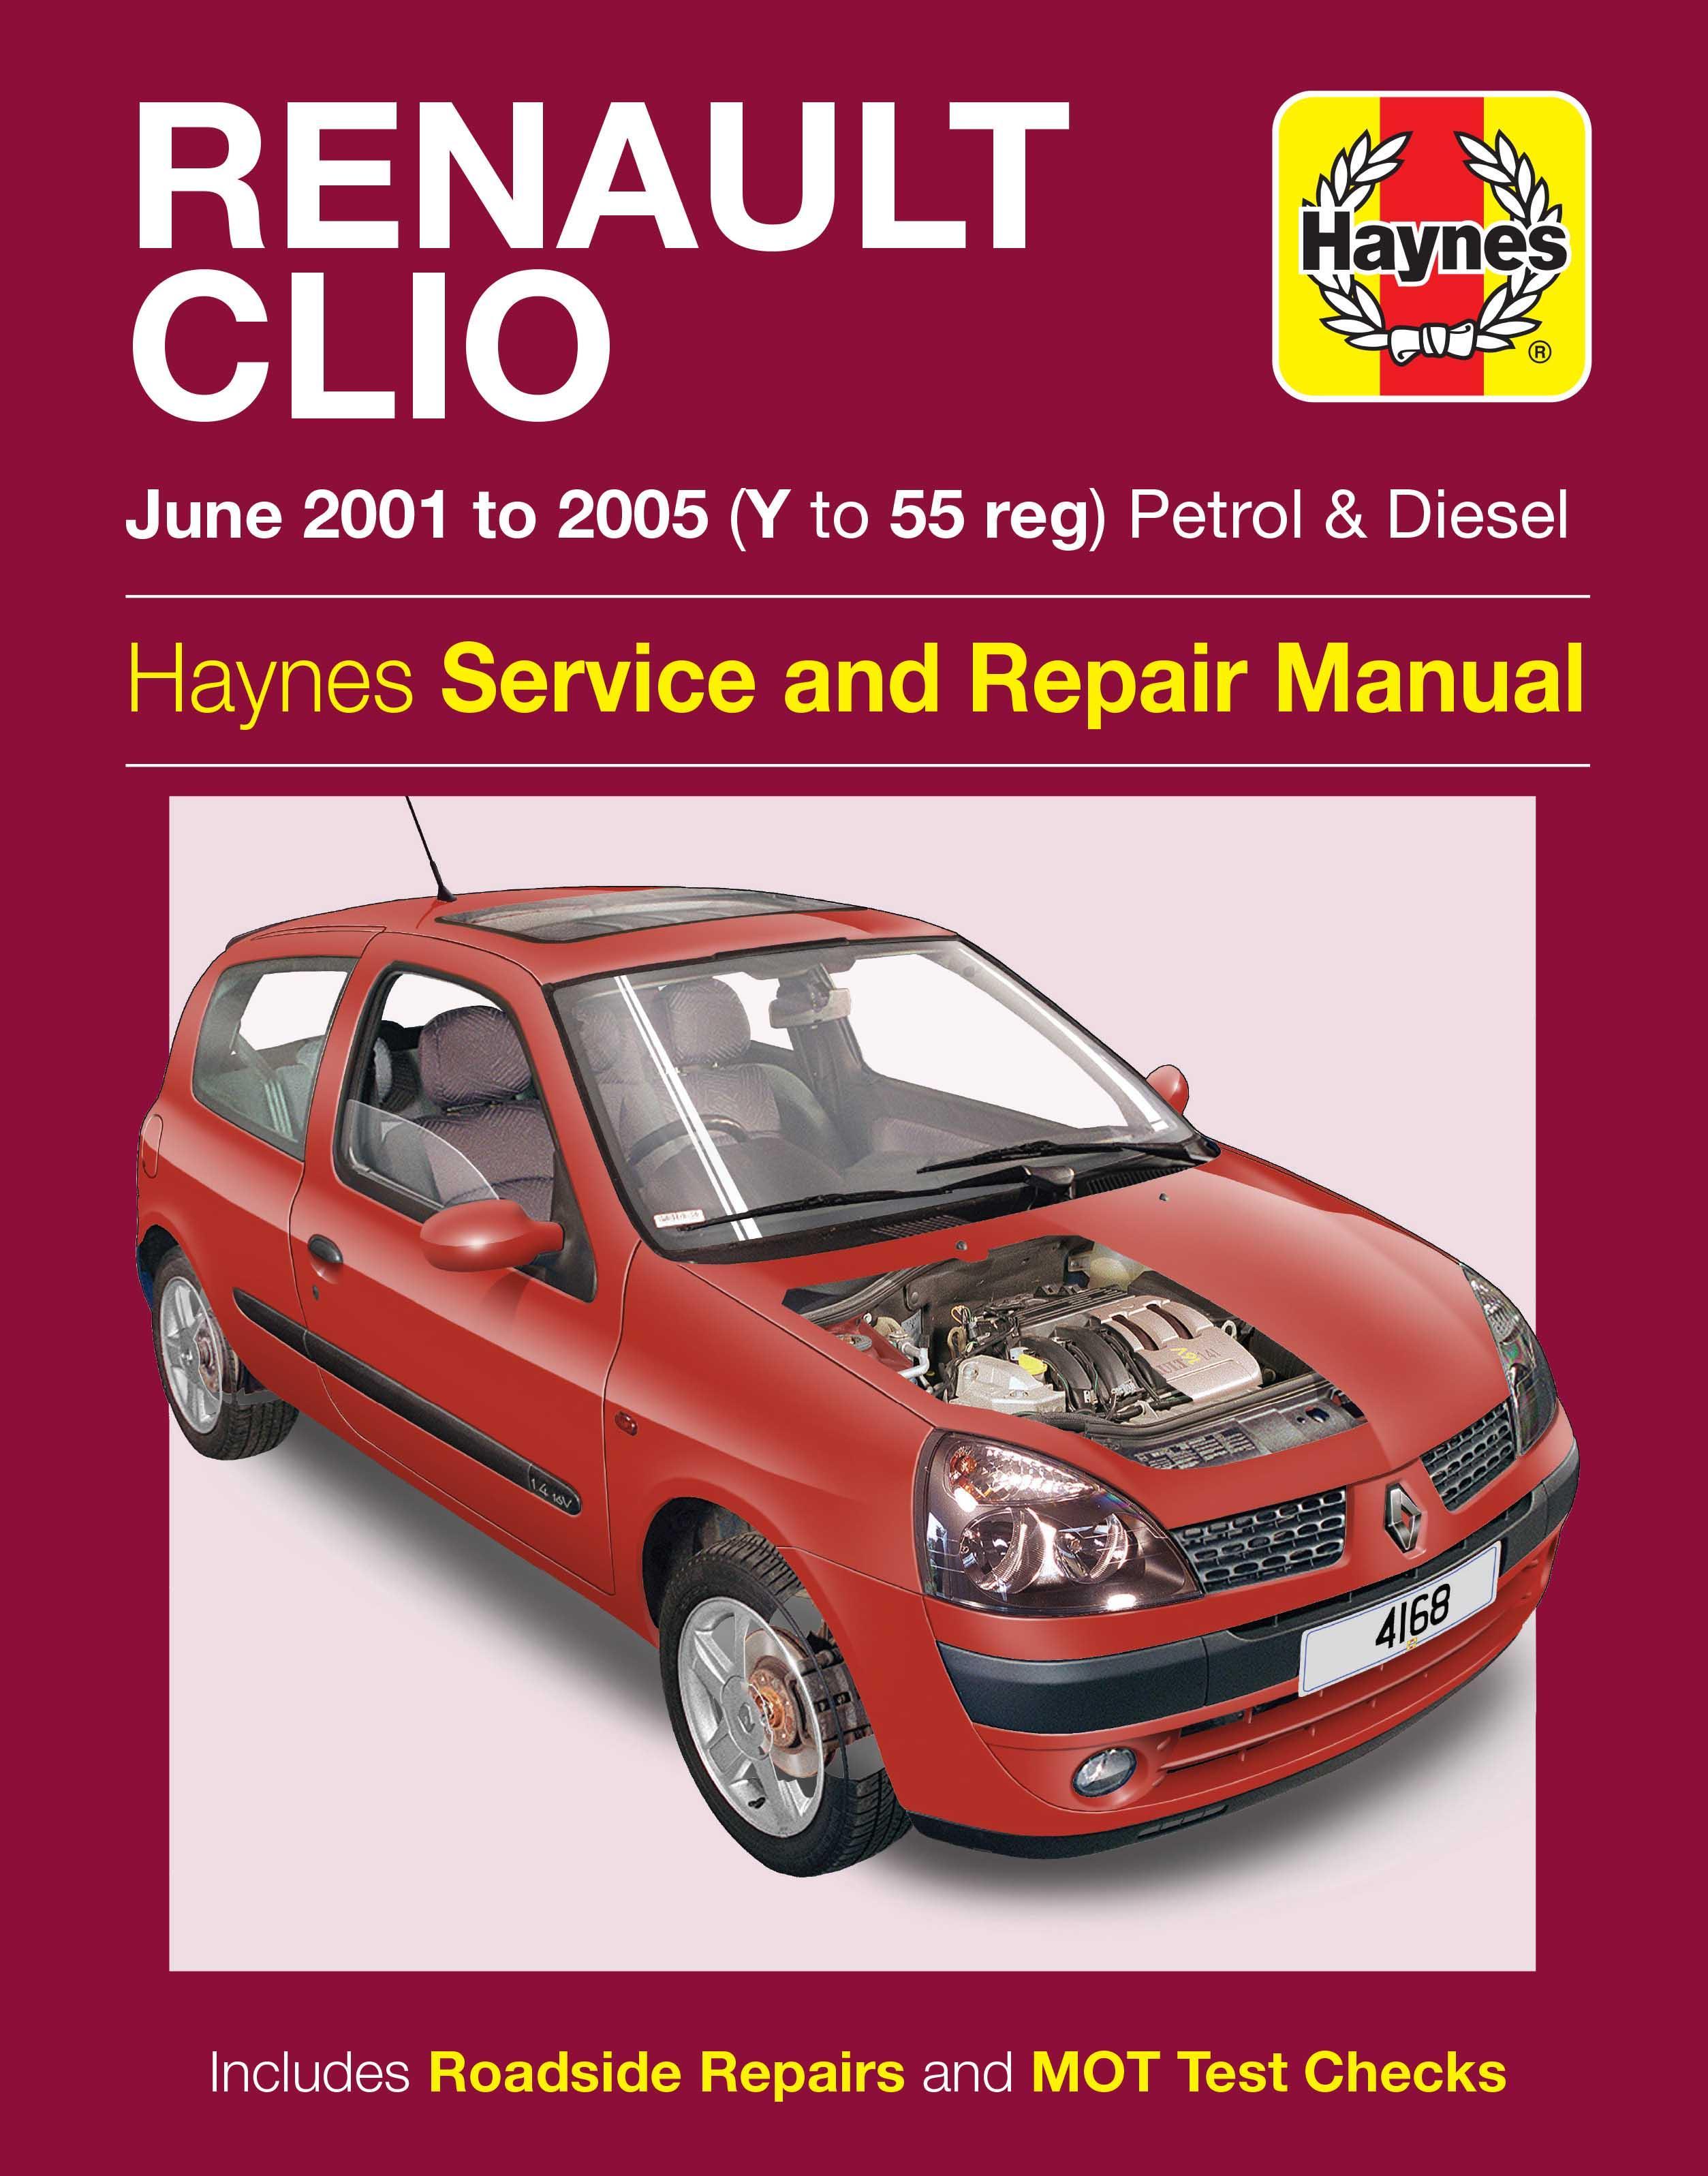 haynes renault clio june 01 05 ma rh halfords com Clymer Manuals Haynes Manuals for 2003 Jeep